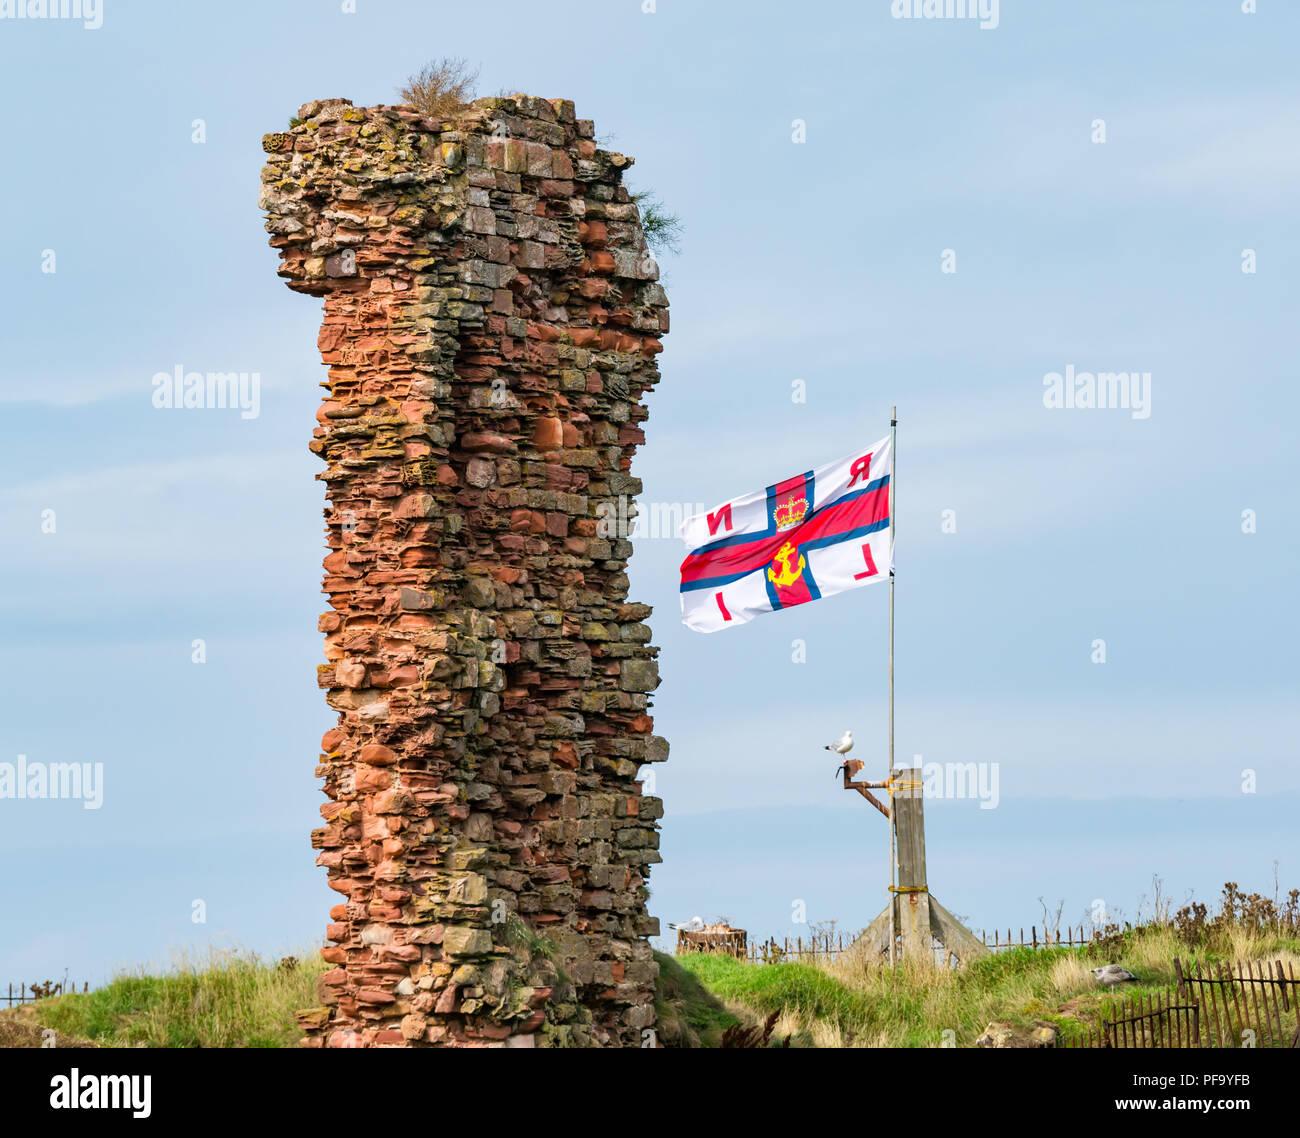 Ruined wall of Dunbar Castle with RNLI flag flying, Dunbar harbour, Dunbar, East Lothian, Scotland, UK - Stock Image